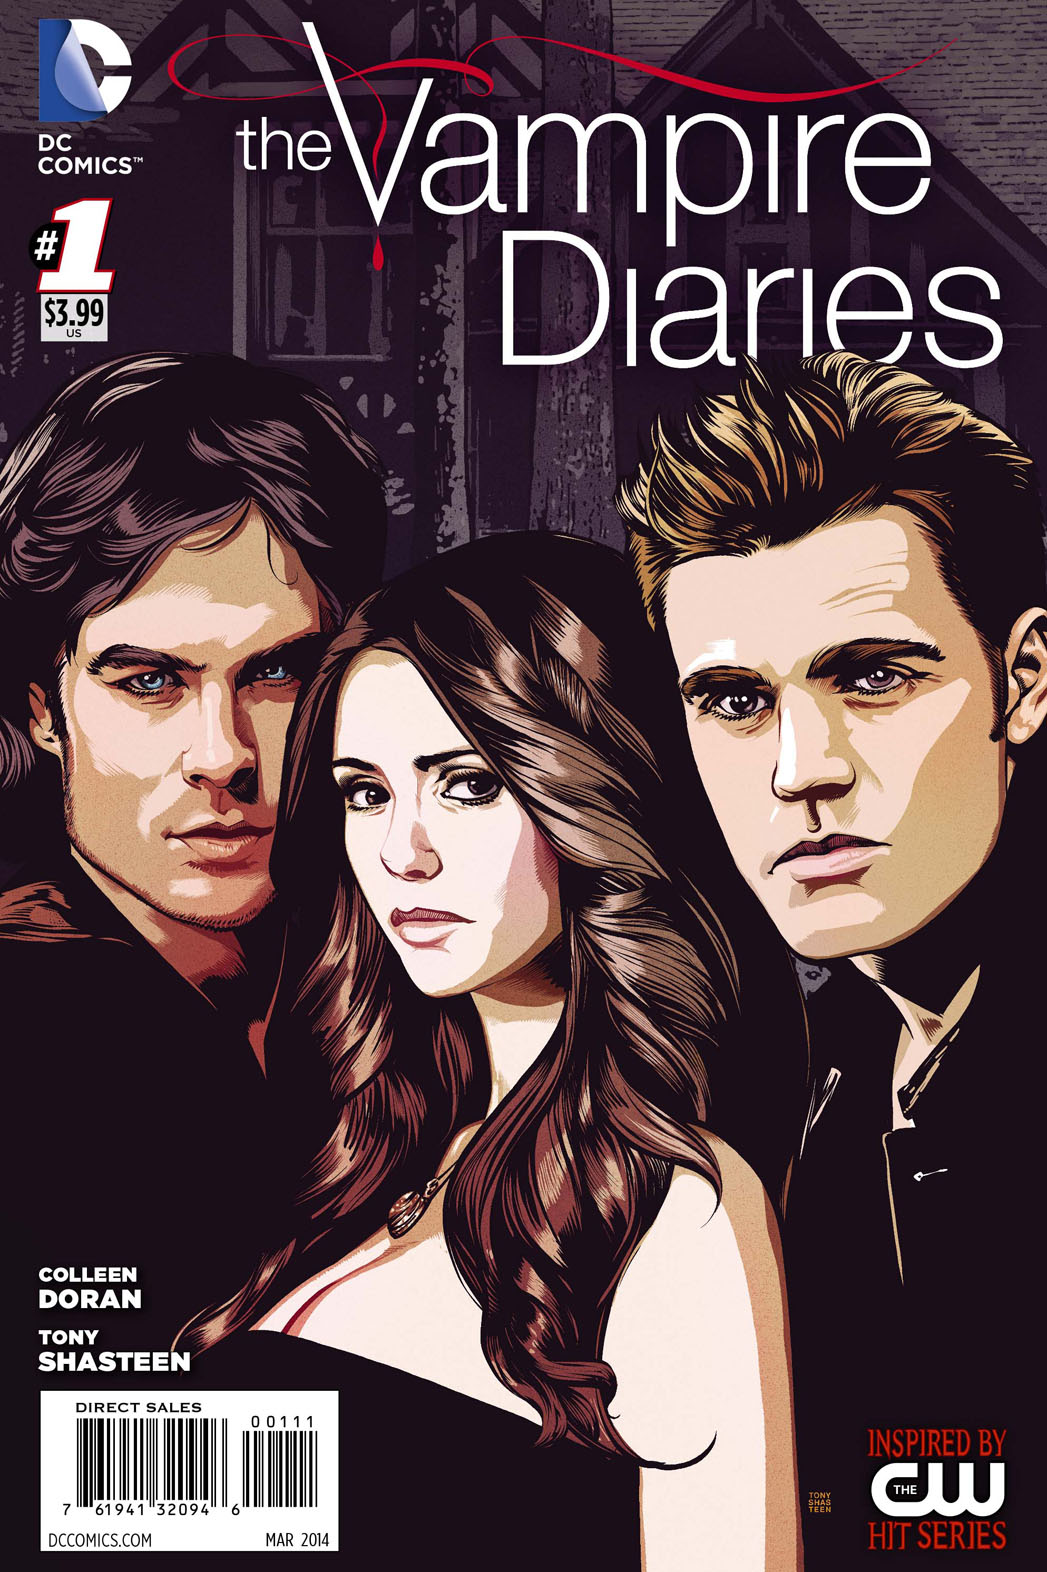 The Vampire Diaries Comic Cover - P 2013